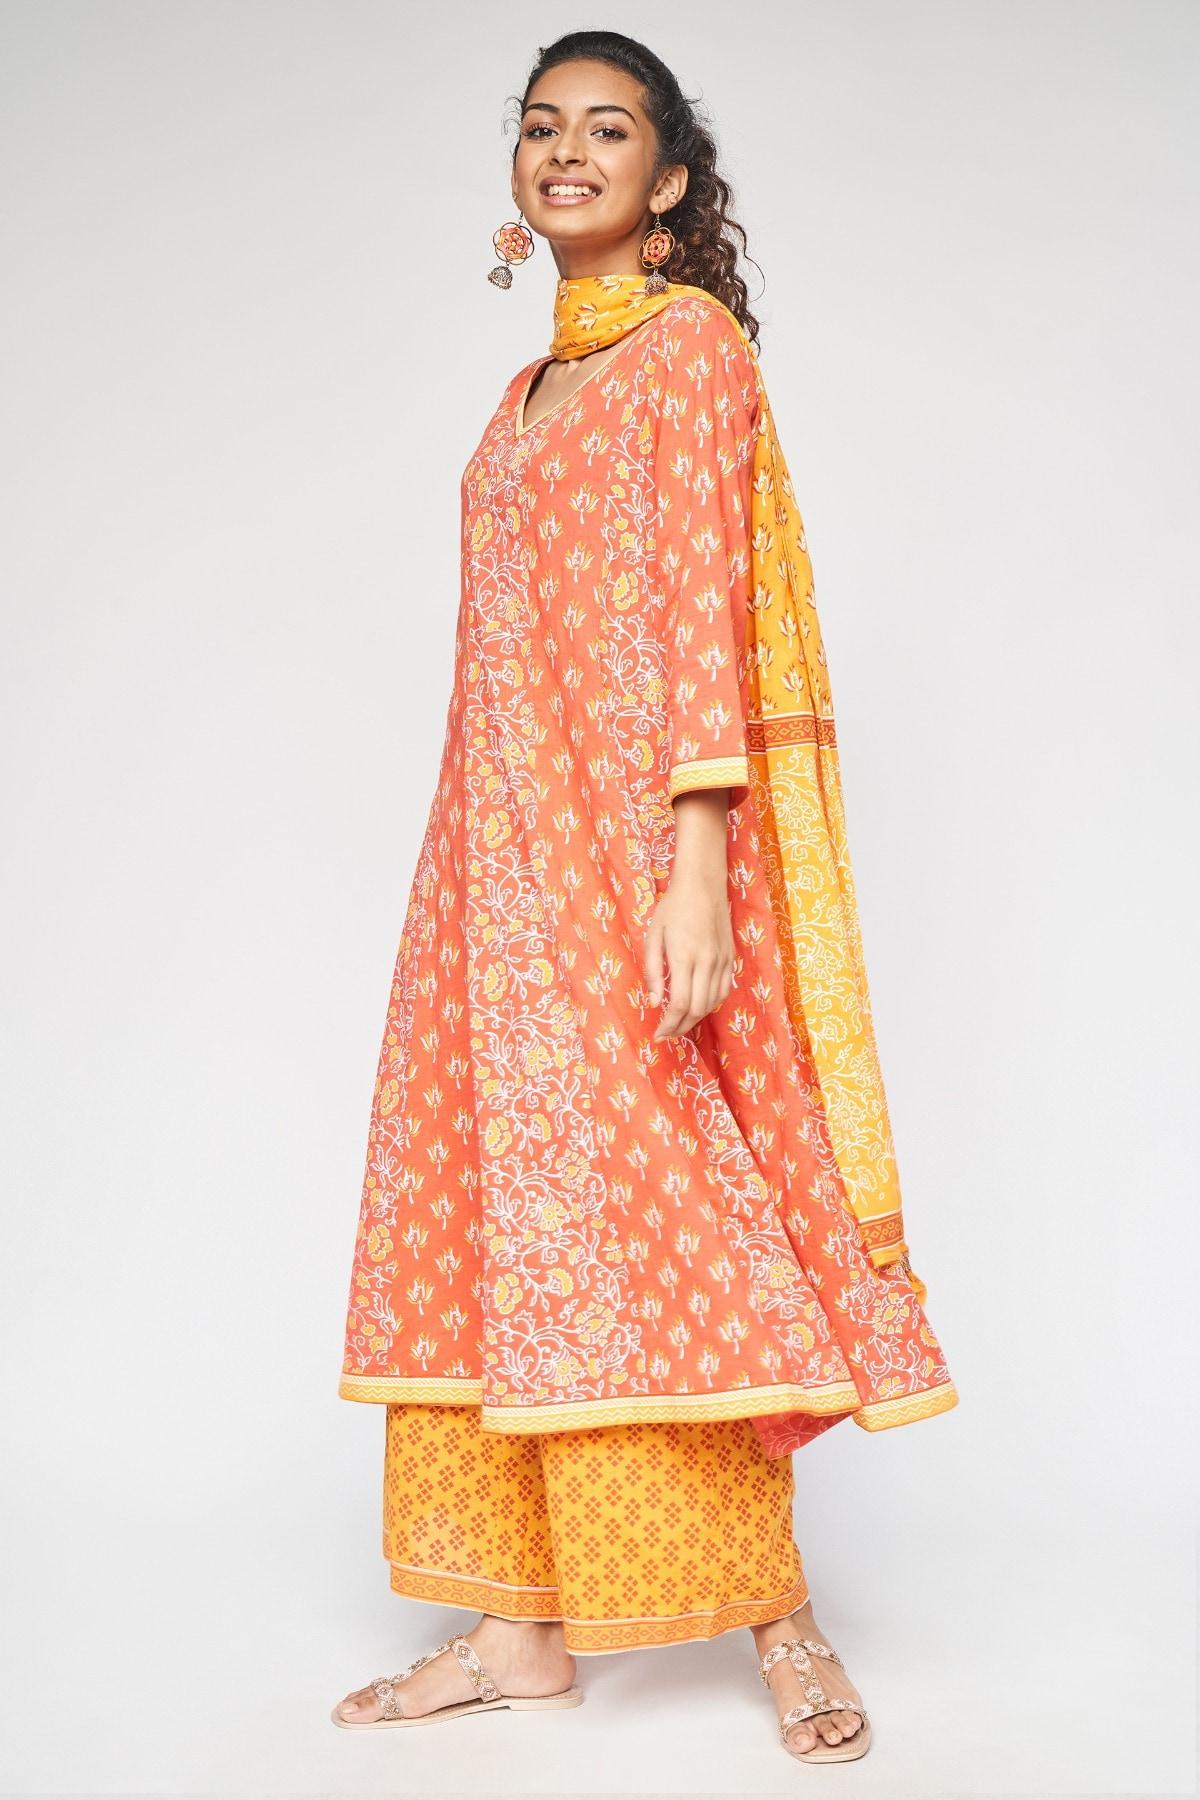 Global Desi | Red Floral Printed Flared Wide-Leg Set